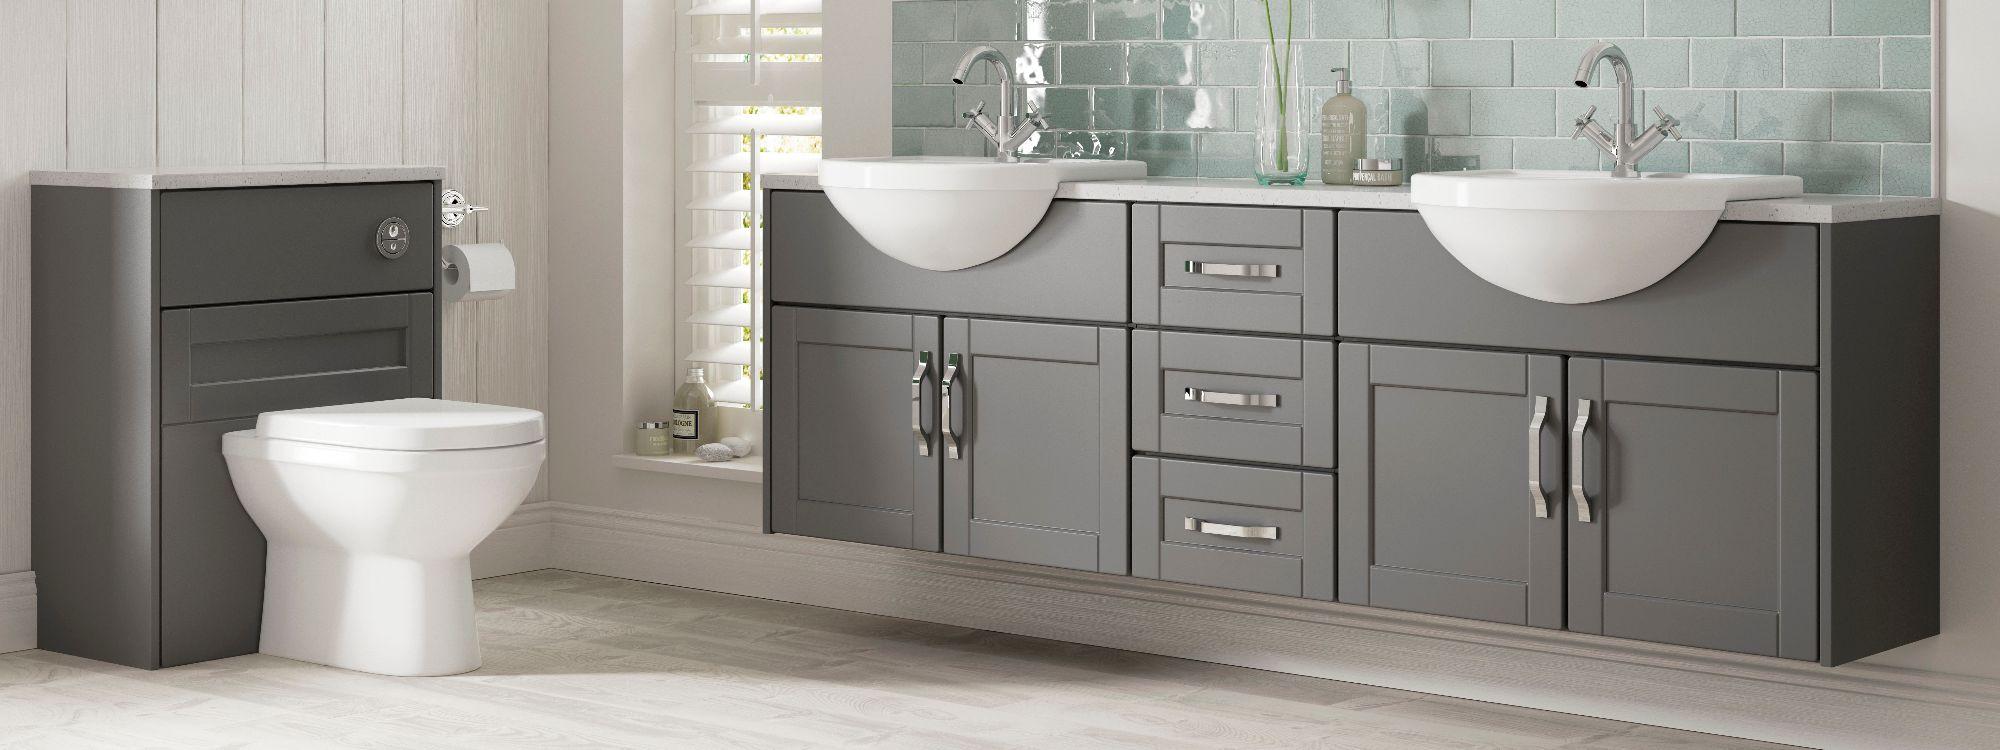 his and hers basins grey bathroom cupboards grey flooring derbyshire